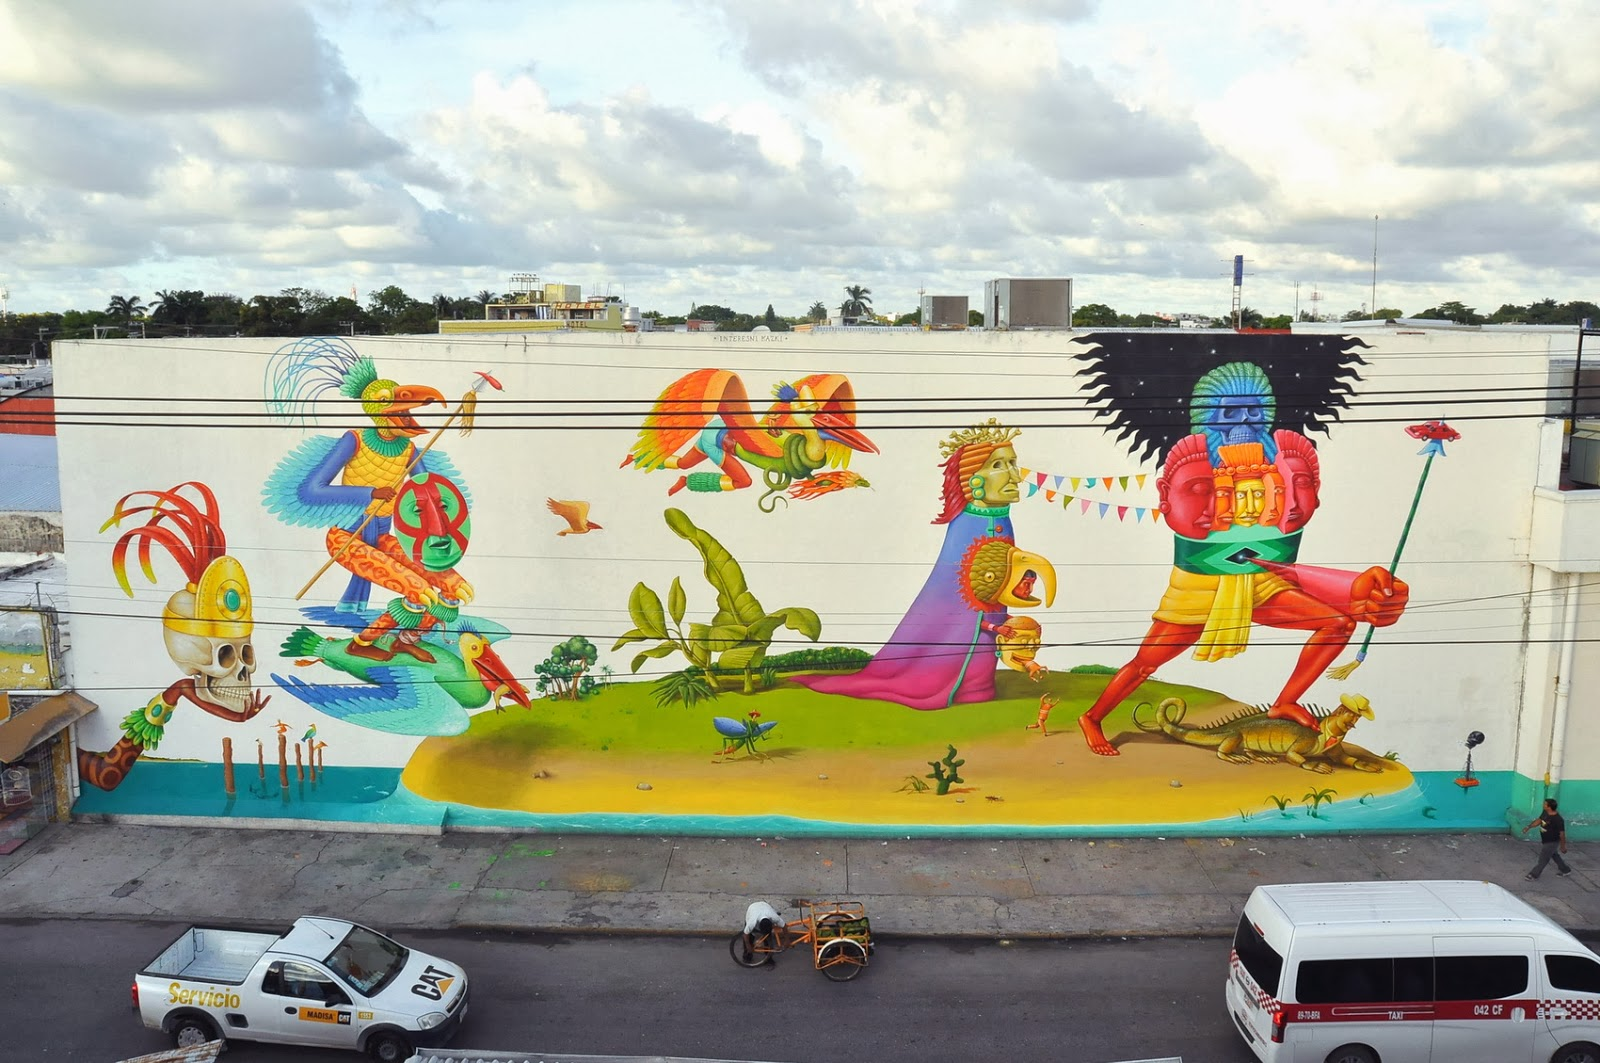 interesni-kazki-new-mural-campeche-mexico-02